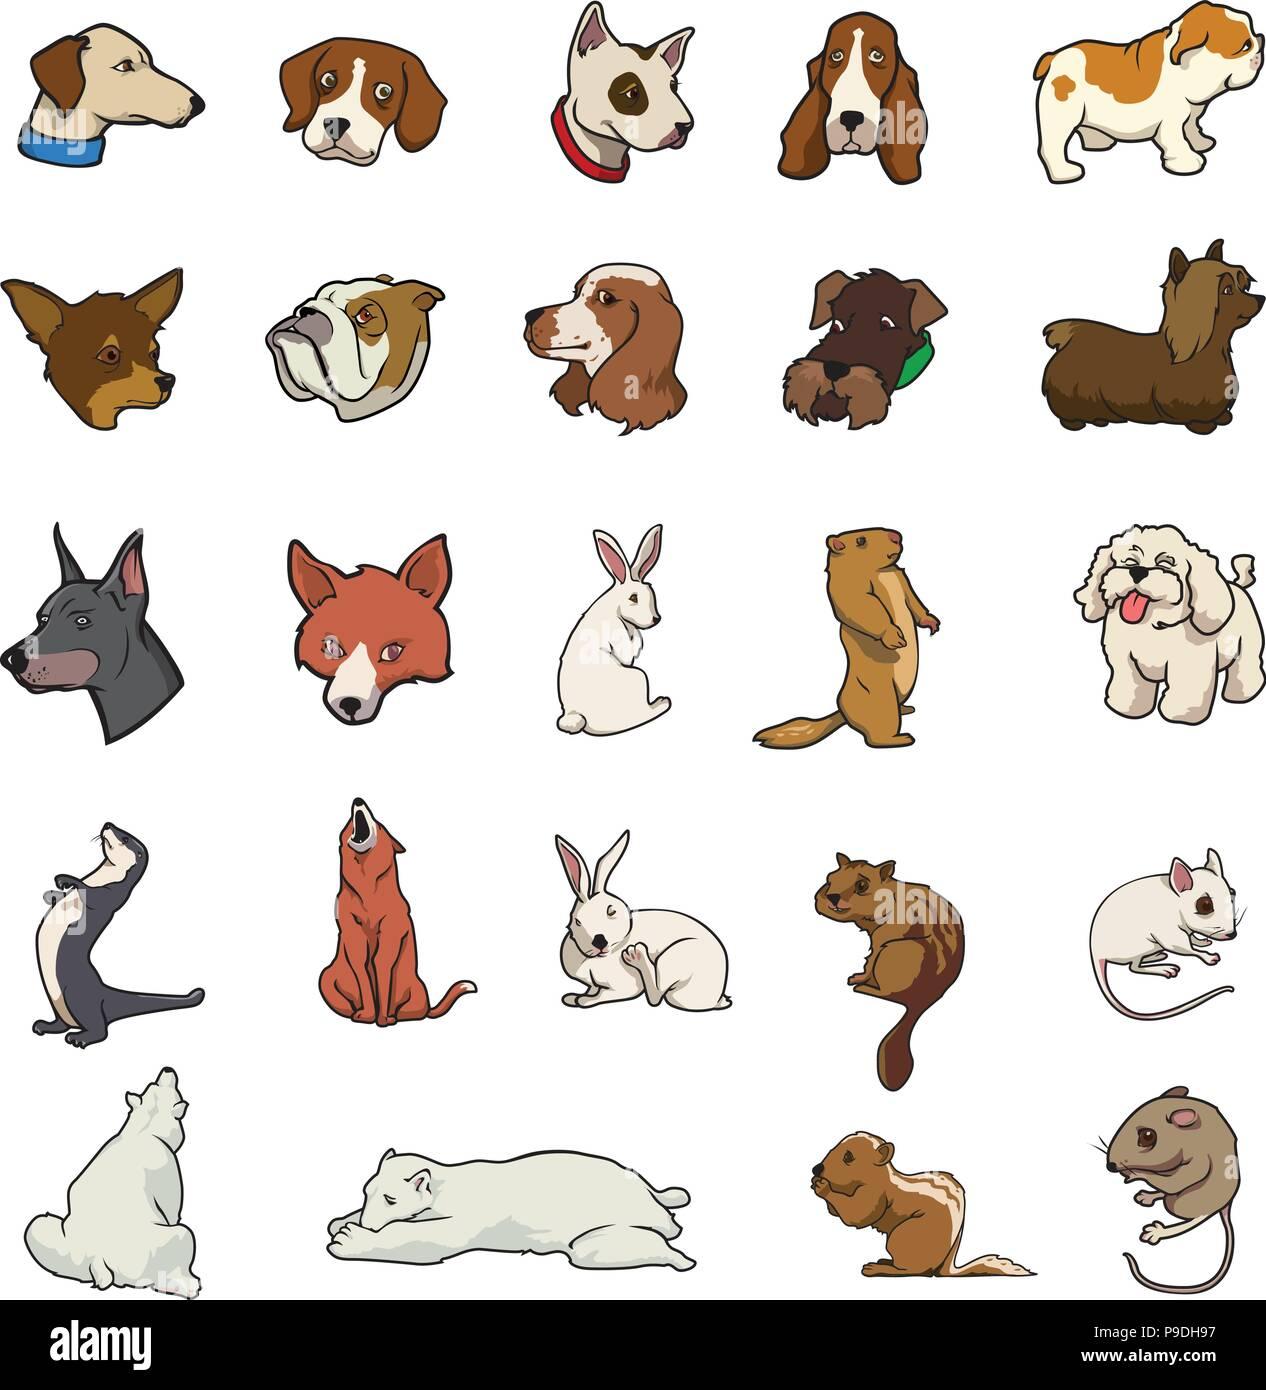 cartoon vector random animal collection - Stock Image